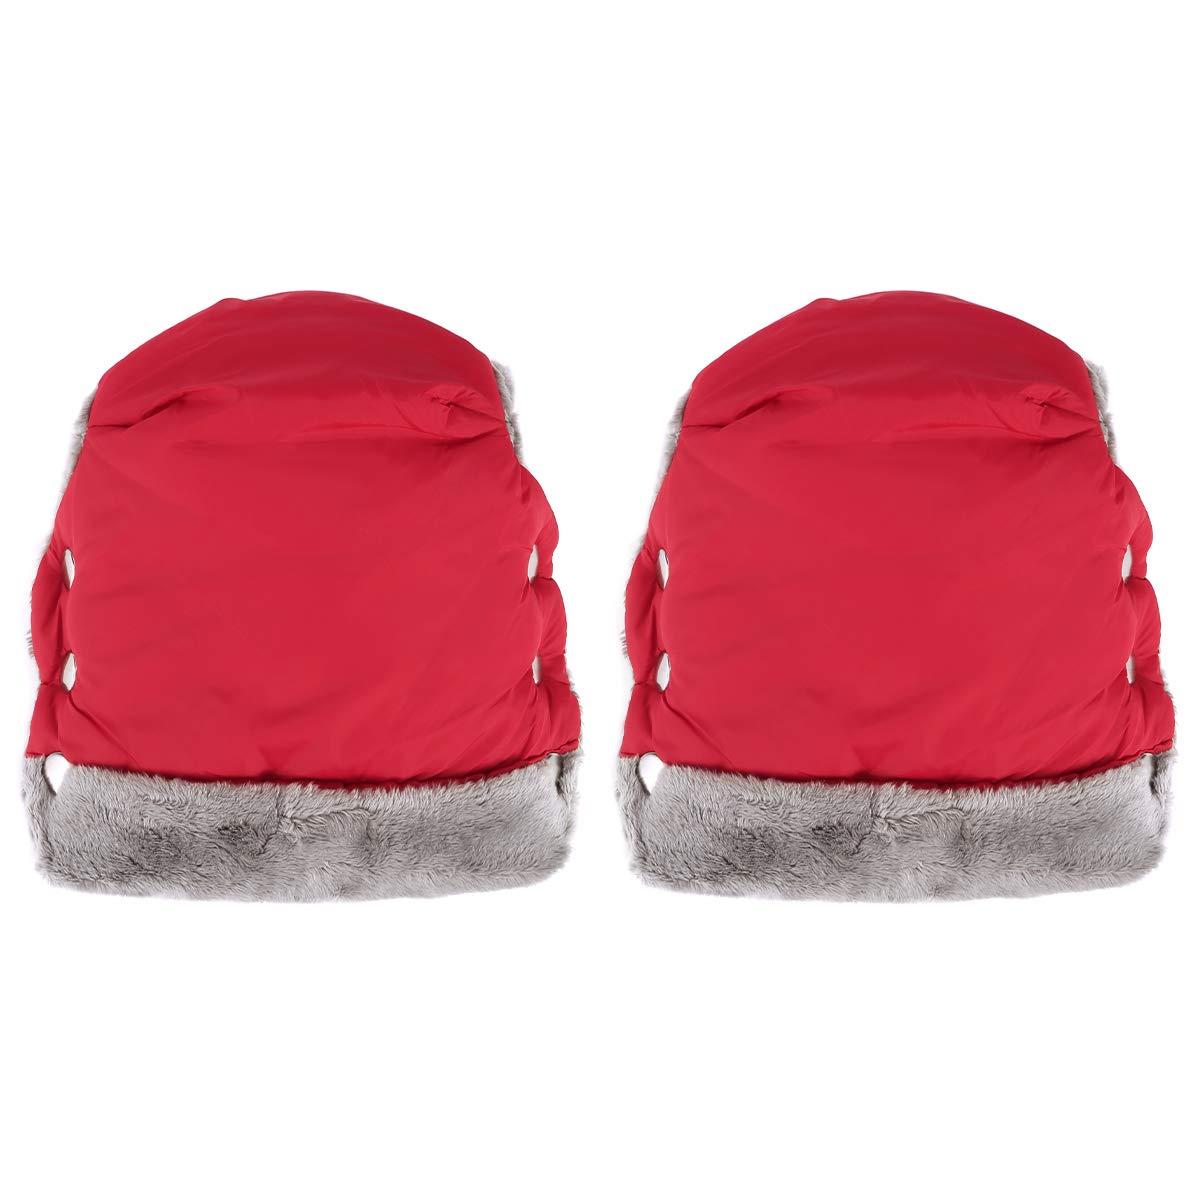 SunshineFace Stroller Hand Muff, Winter Waterproof Hand Warmer Baby Stroller Pushchair Mittens with Universal Fit